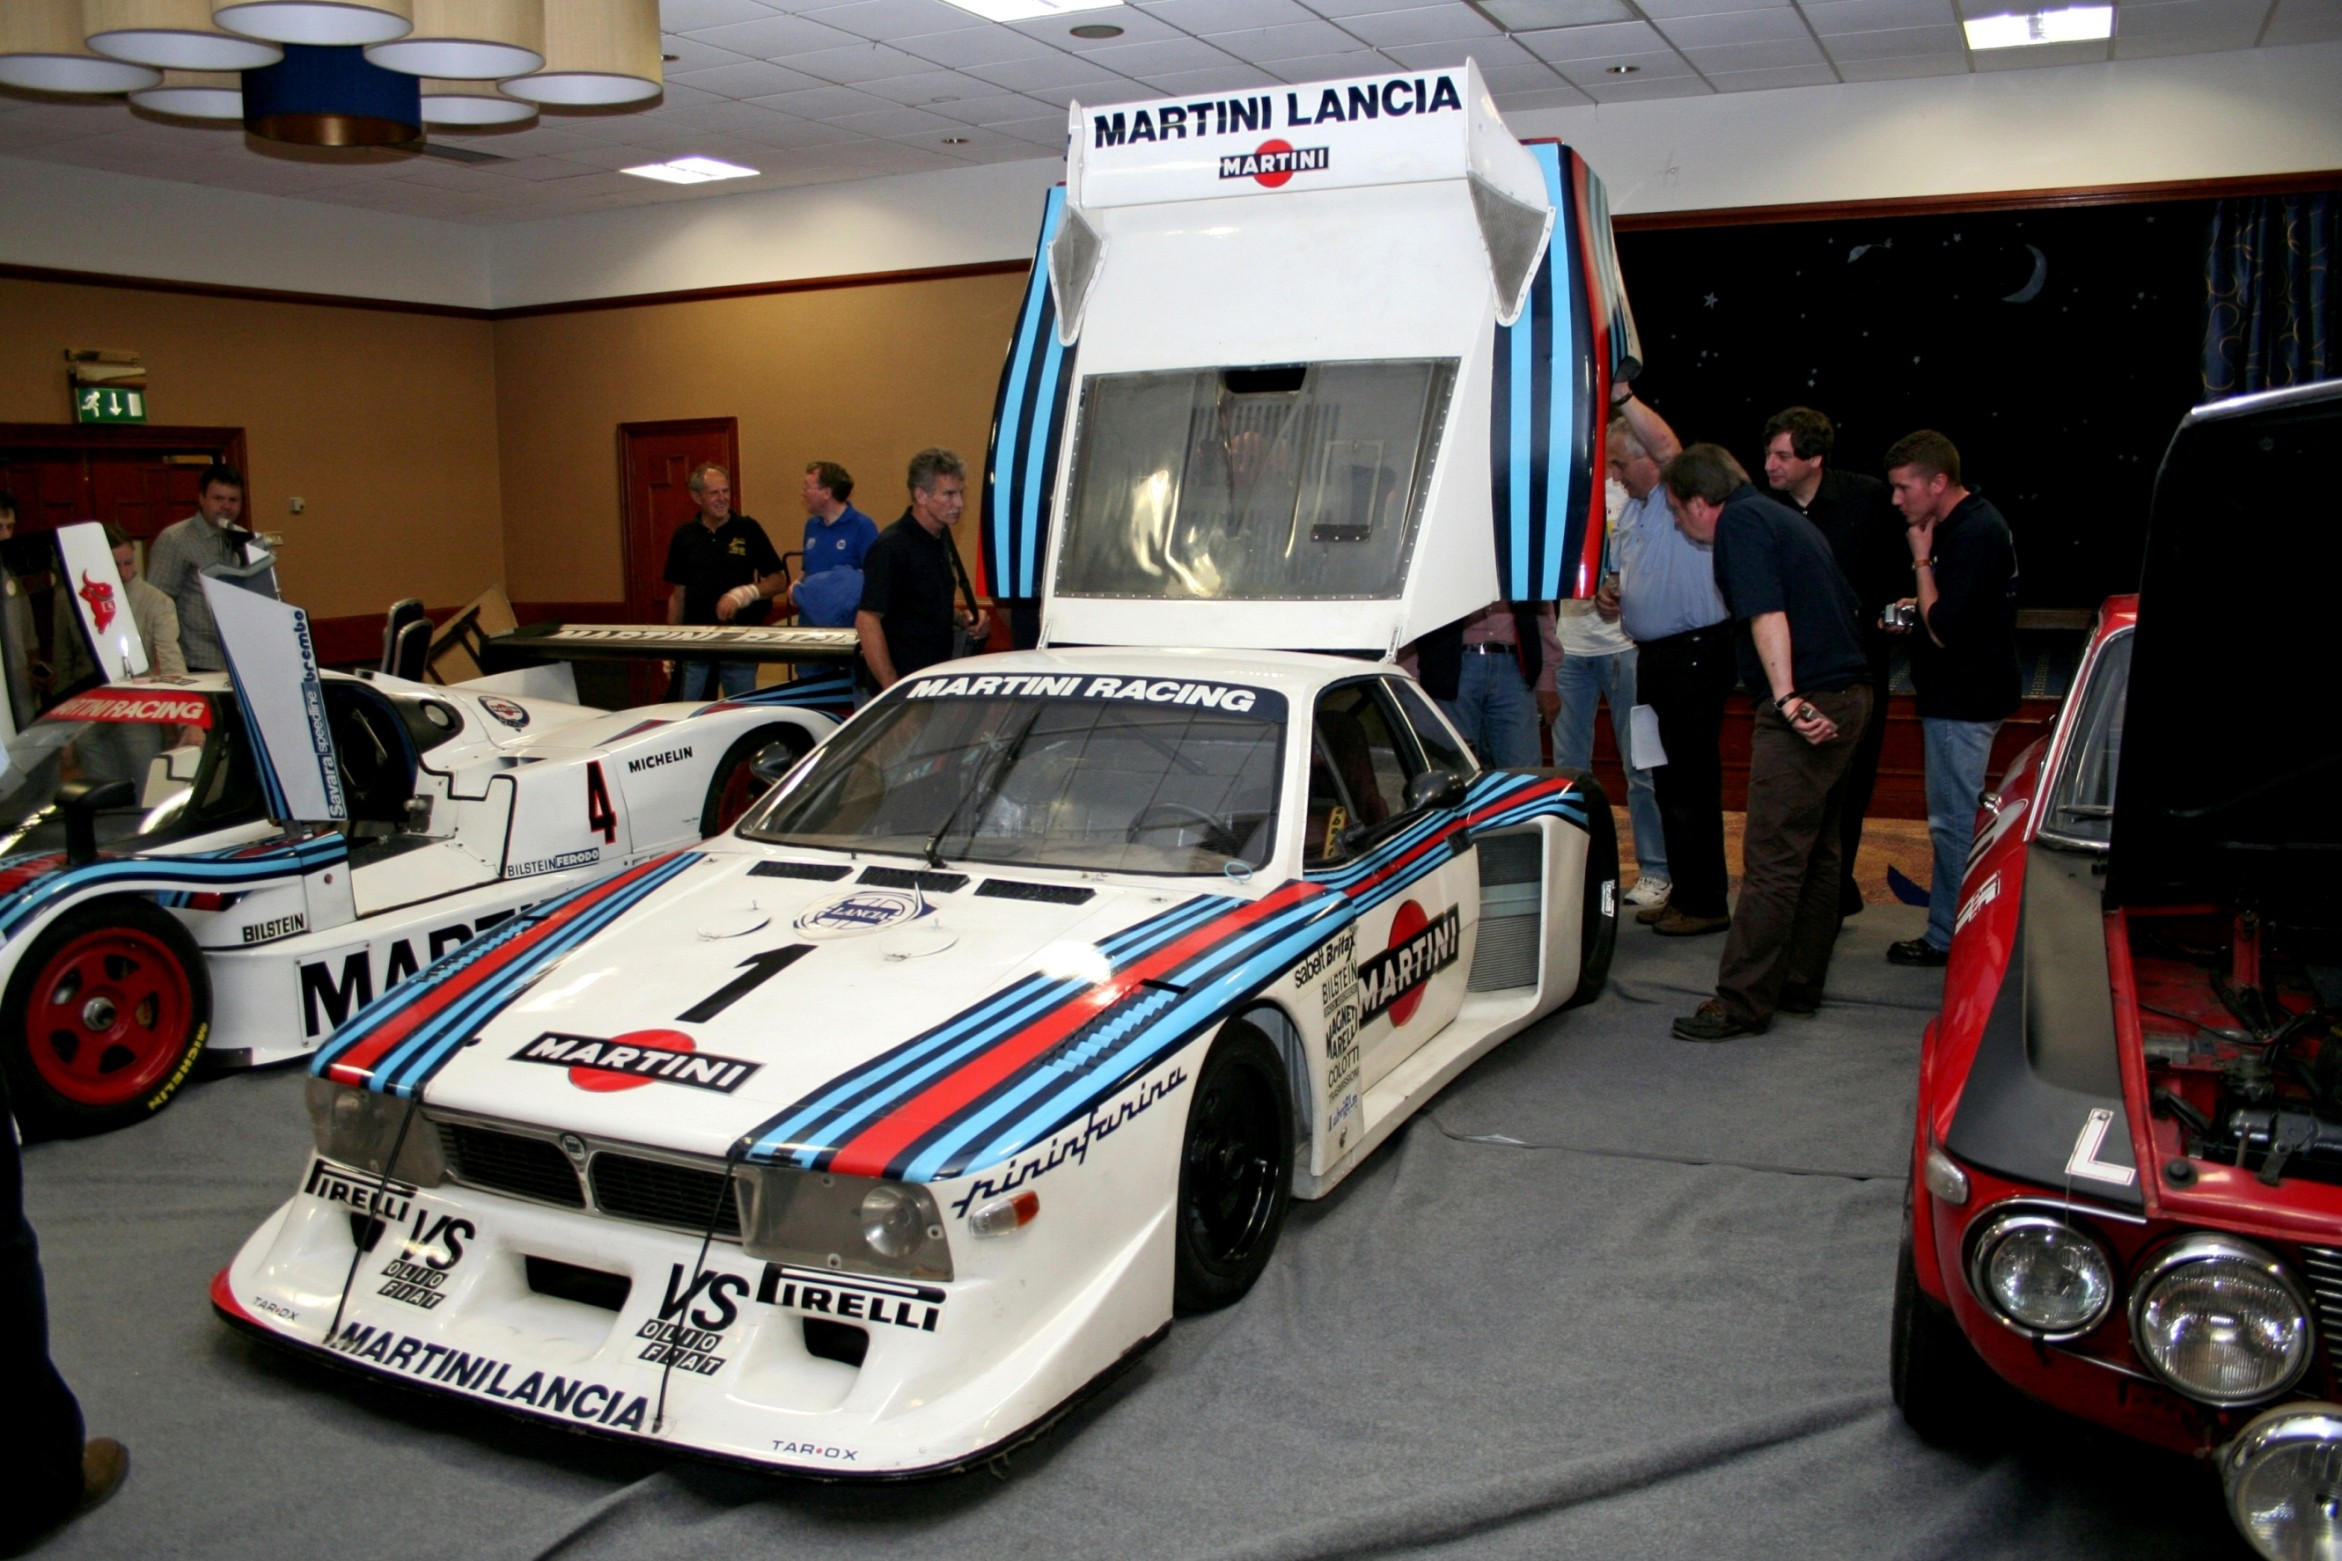 http://www.car-revs-daily.com/wp-content/uploads/Car-Revs-Daily.com-Rally-Legends-1983-Lancia-Beta-Montecarlo-and-1982-Lancia-037-at-Goodwood-2014-28.jpg